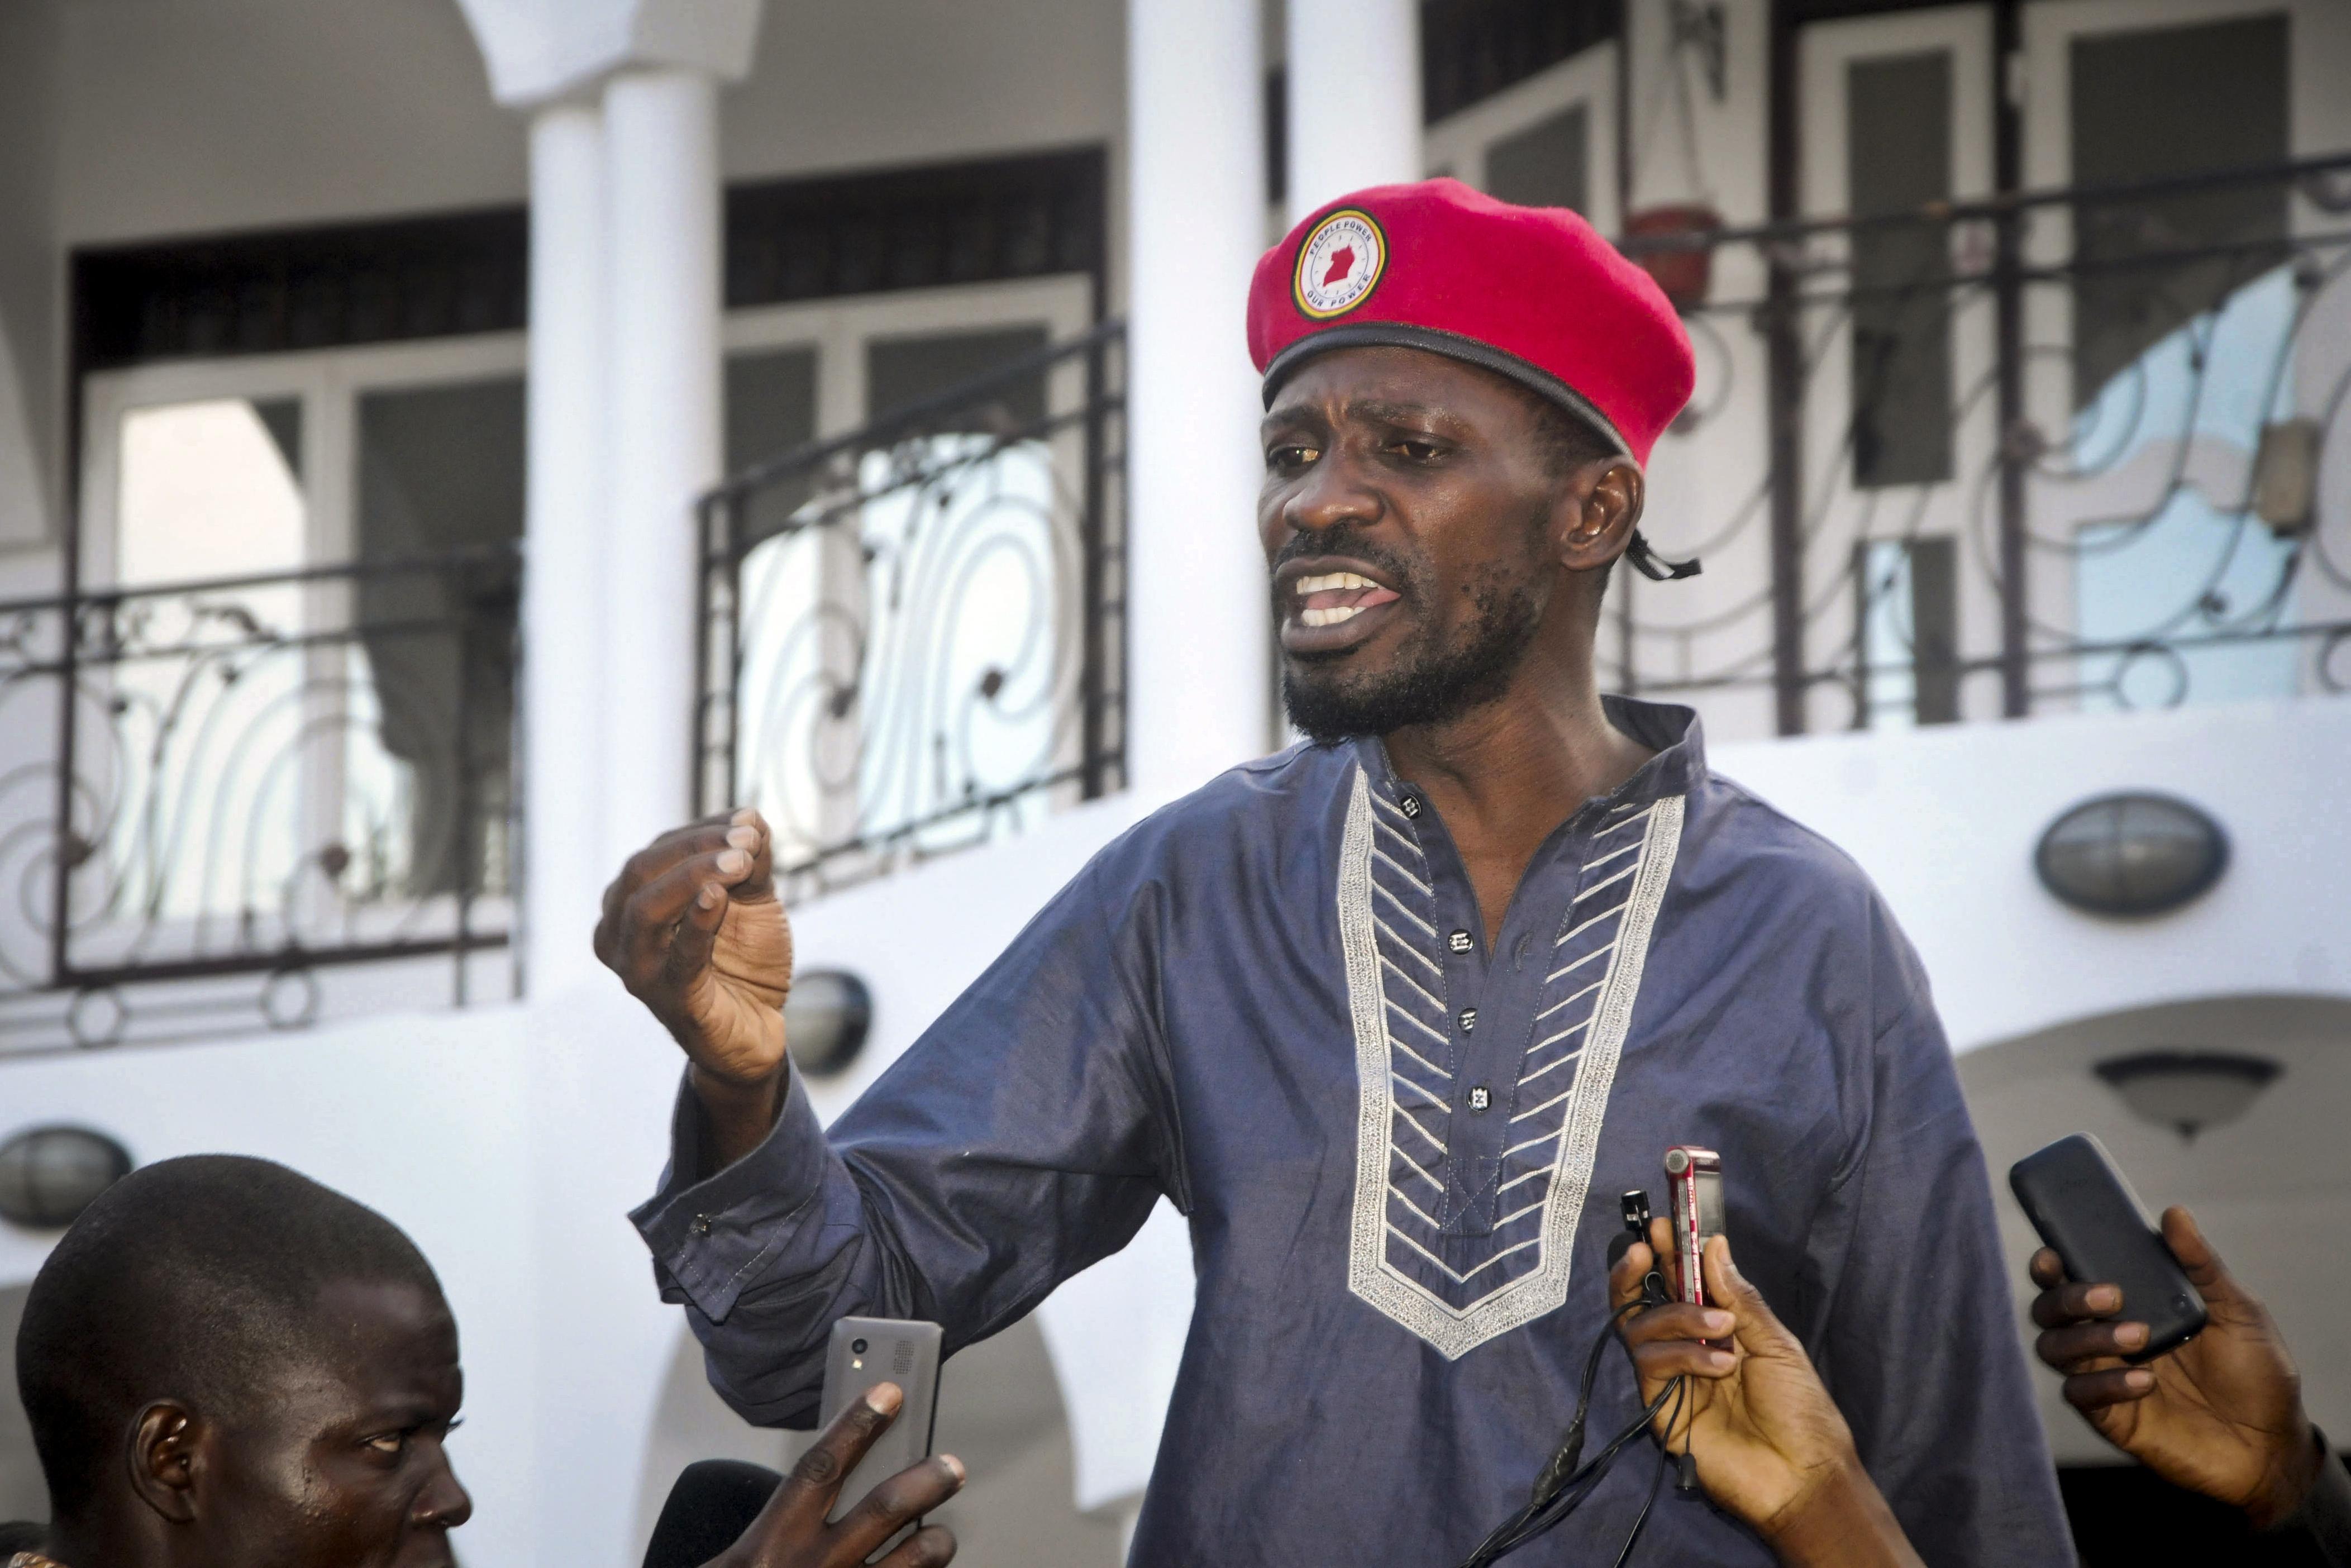 Uganda police detain Bobi Wine, foil meeting with supporters